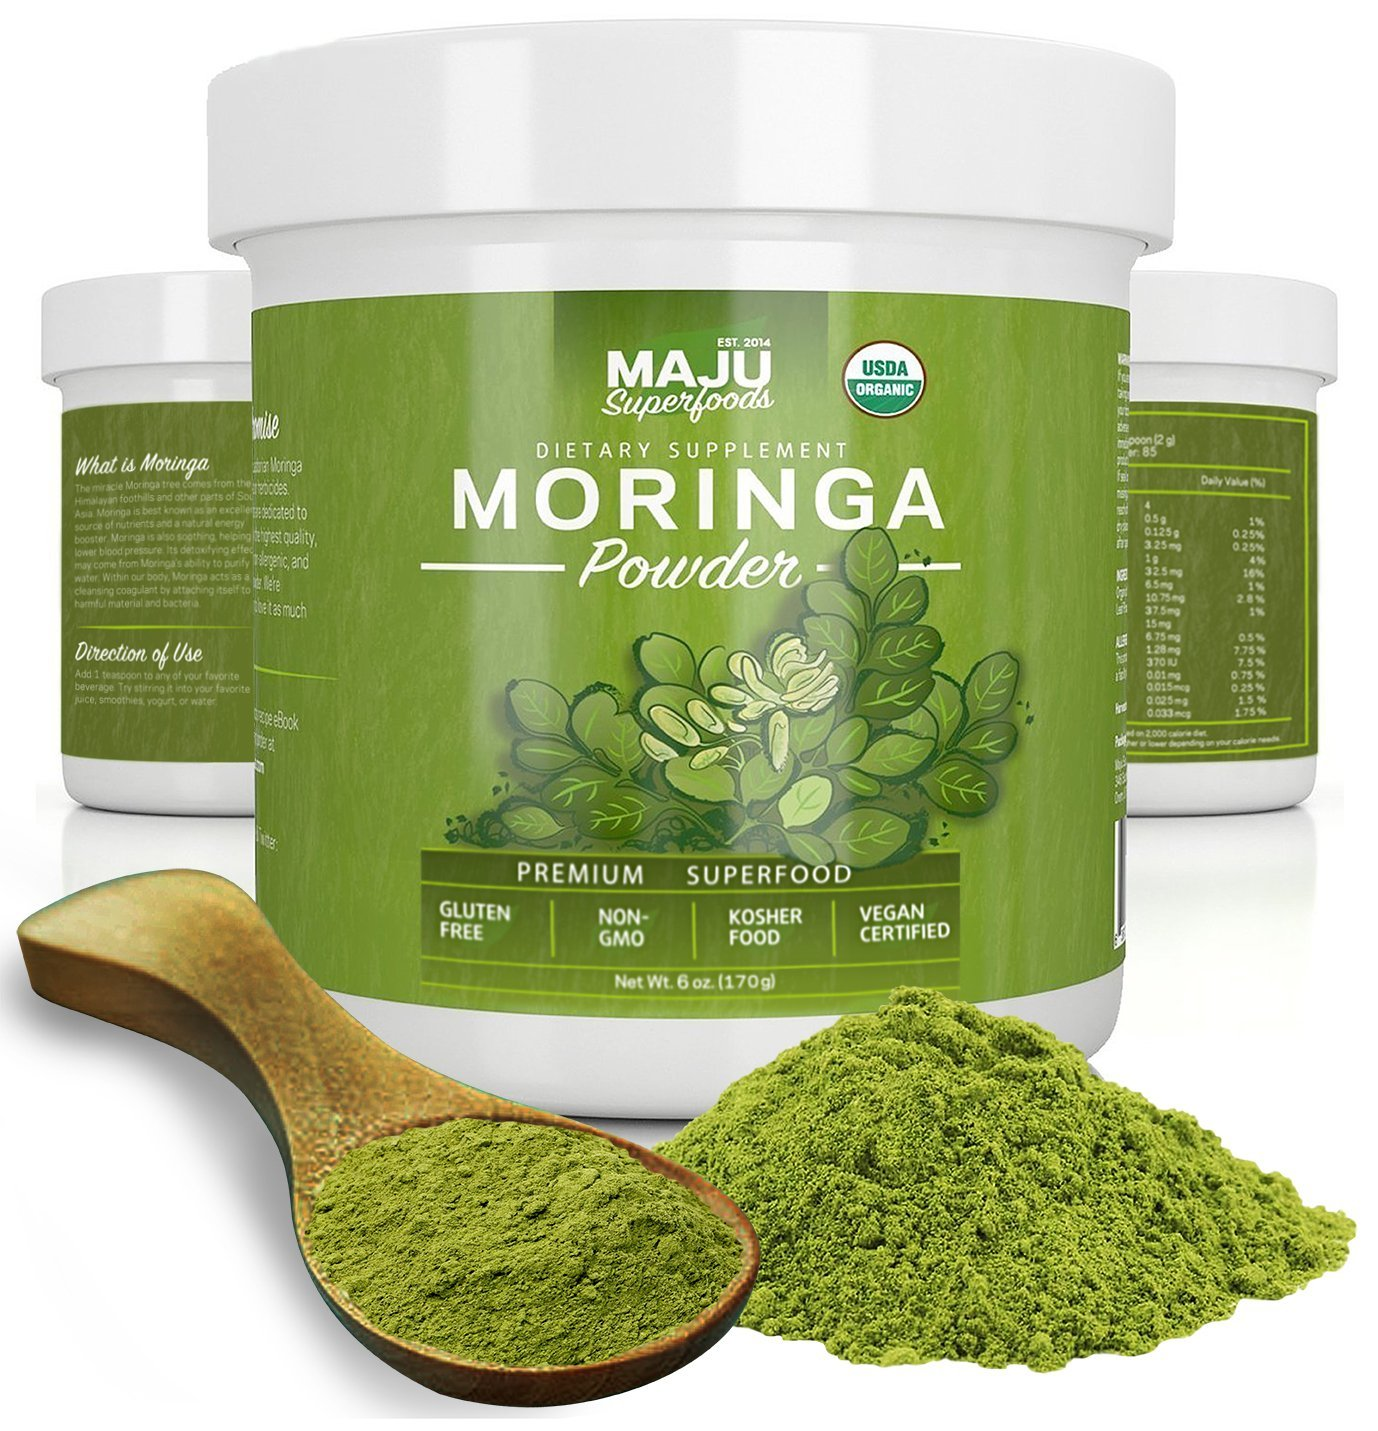 Maju's Organic Moringa Powder